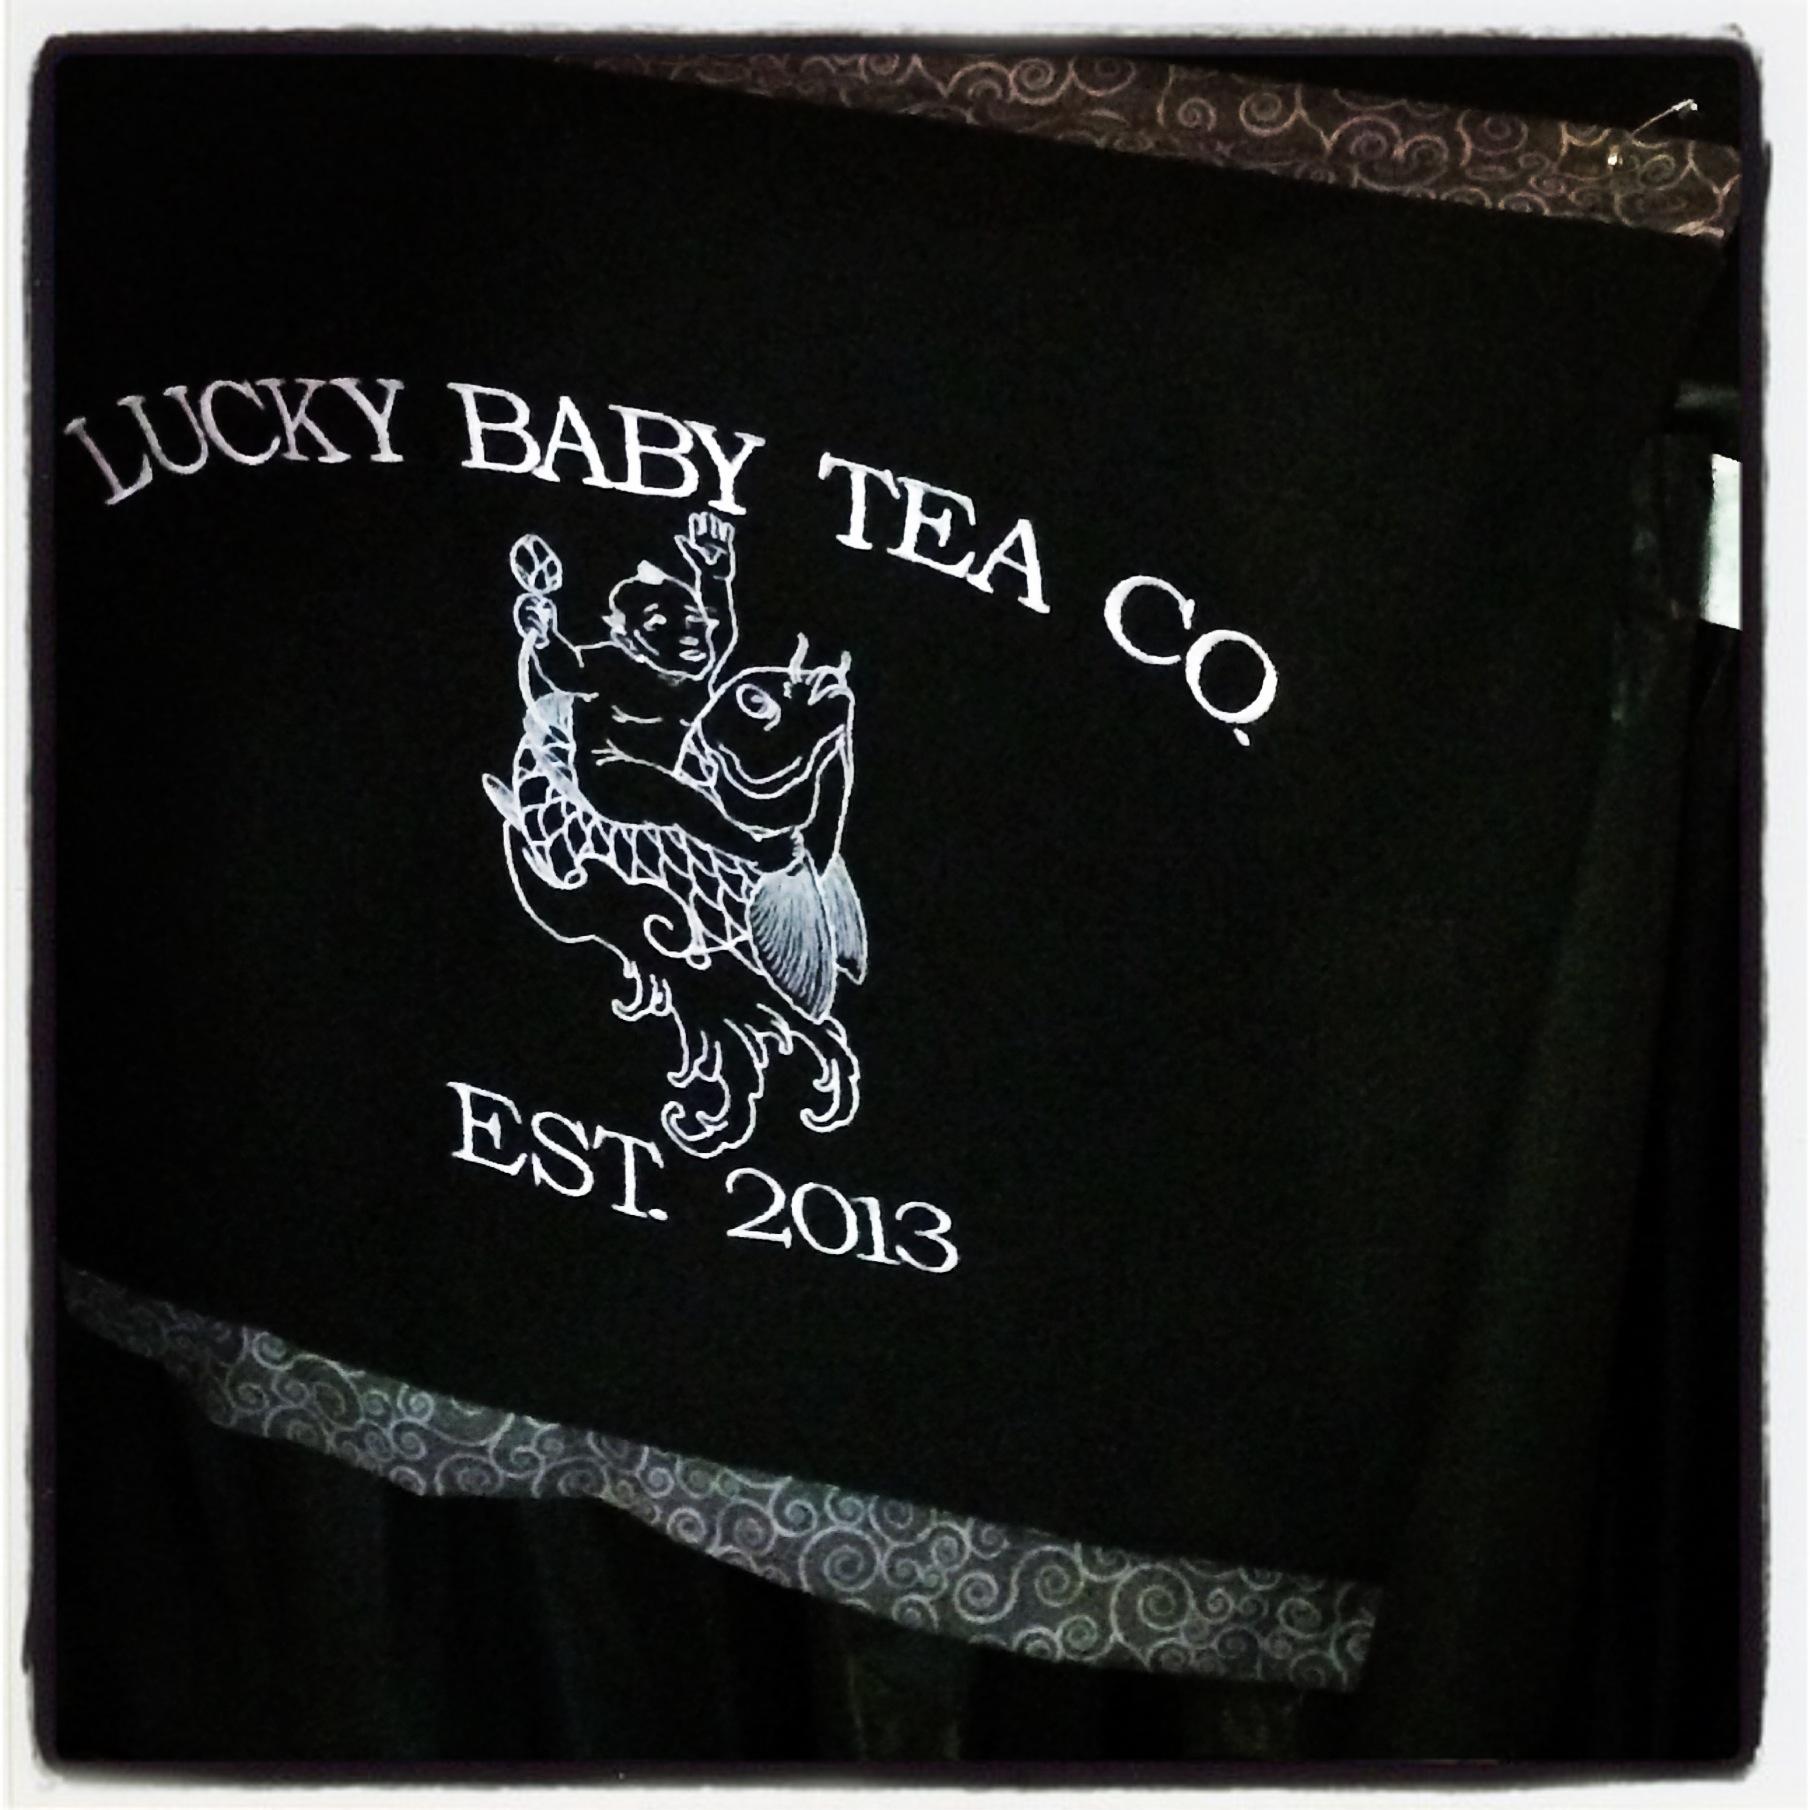 Lucky Baby Tea Company